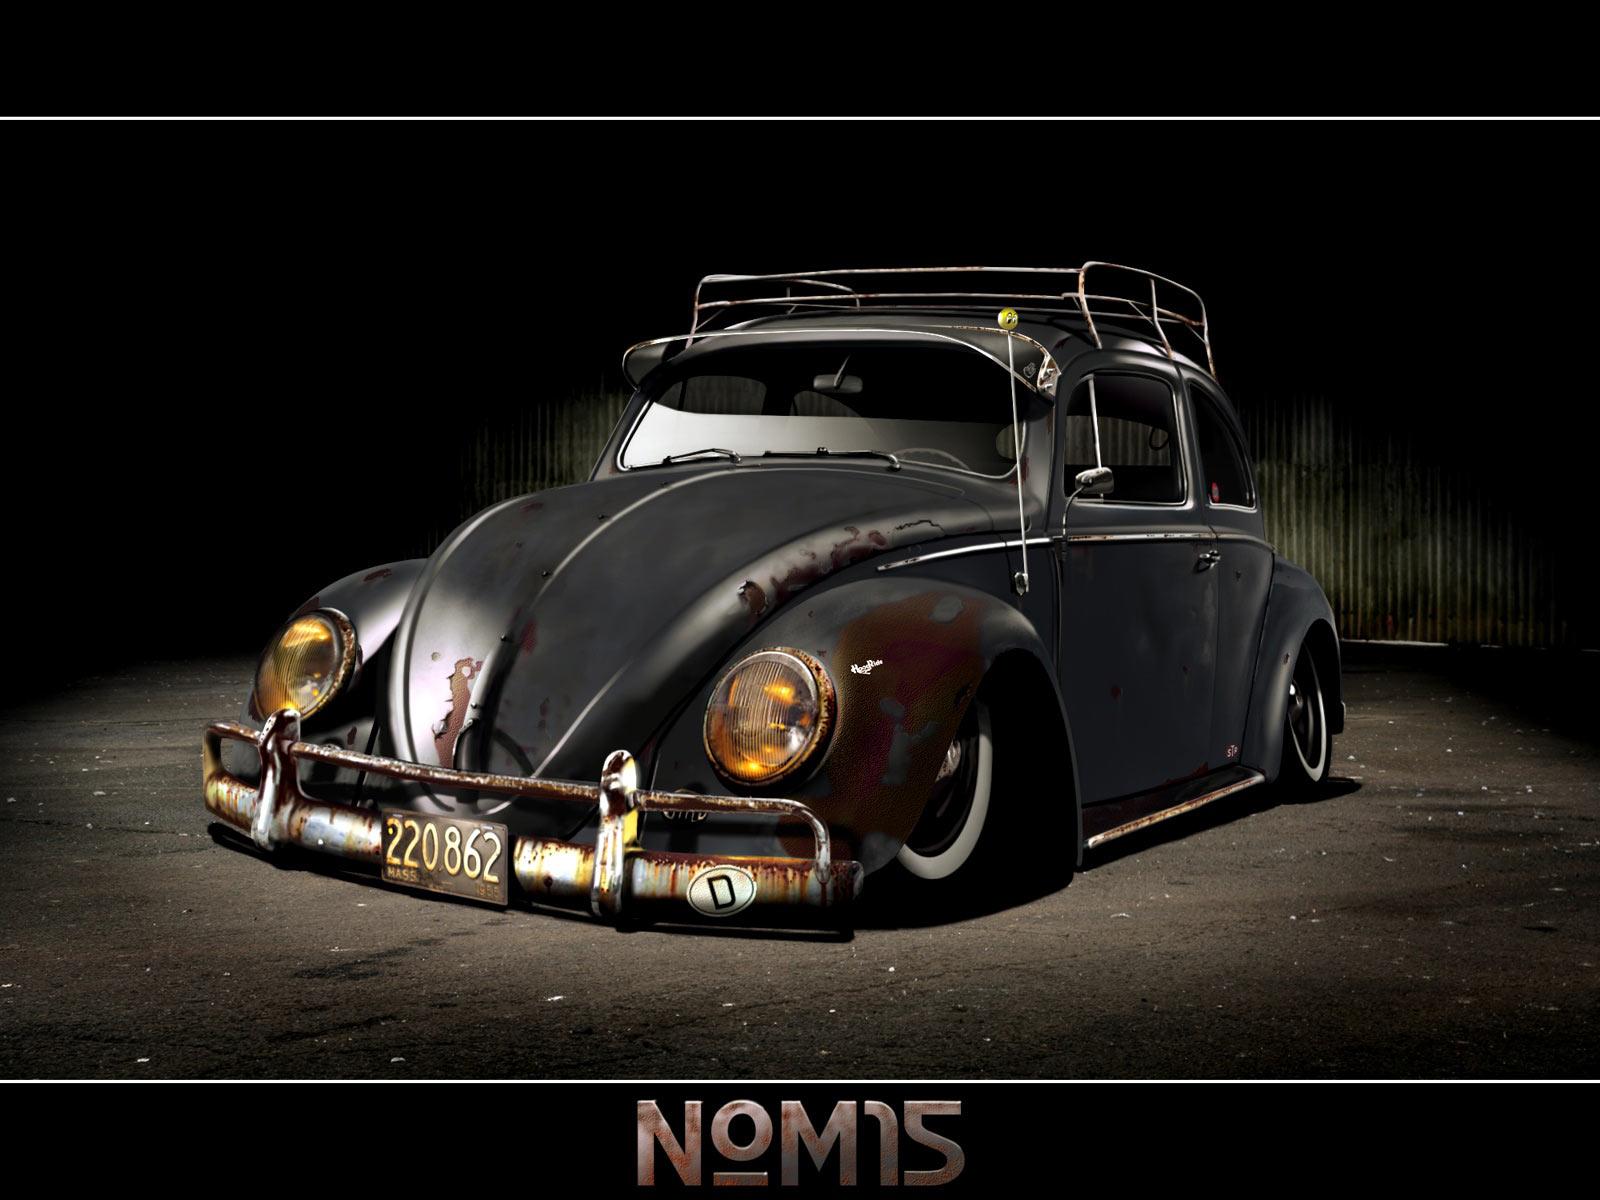 http://3.bp.blogspot.com/-3oxowOJYmXE/UH464nYl19I/AAAAAAAAAKM/rai7elk9YRI/s1600/old+car+wallpaper+for+desktop.jpeg